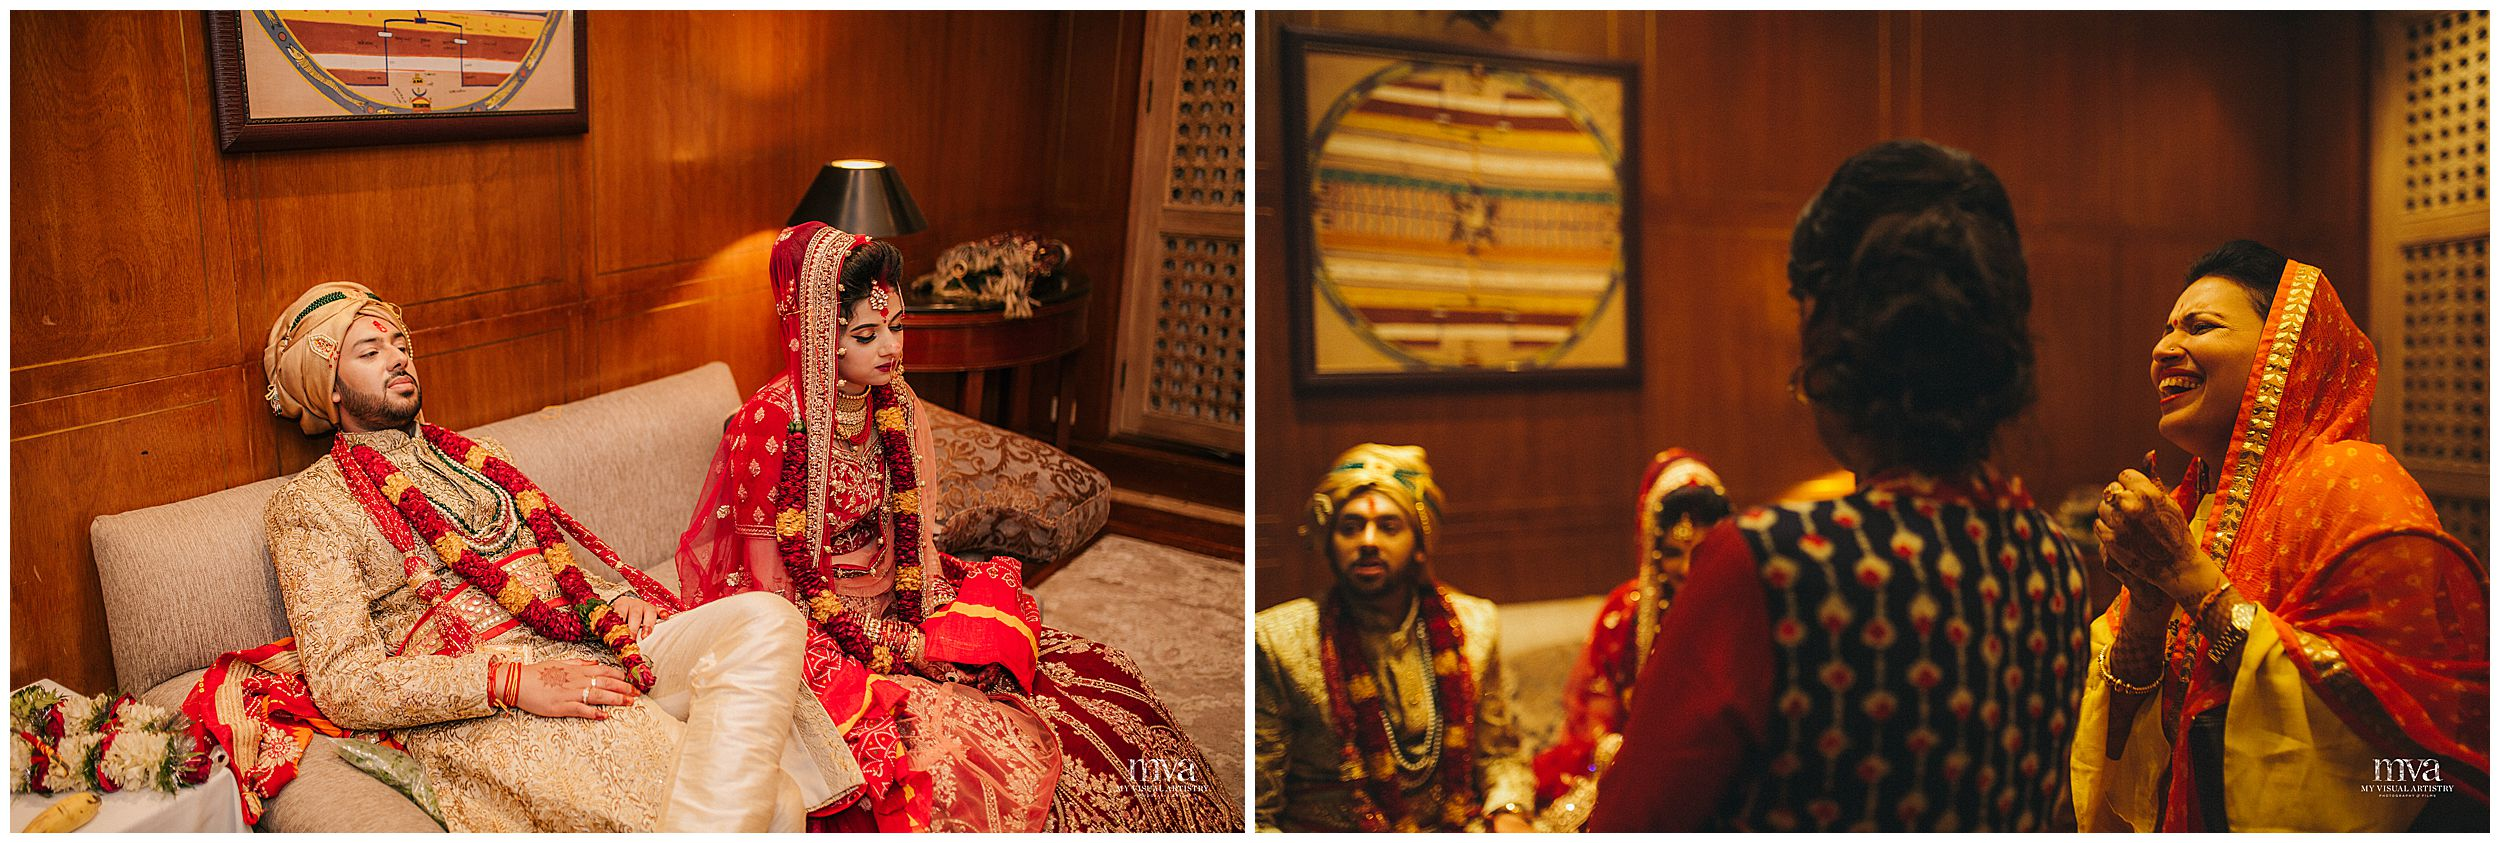 SONAAL_AMI_MYVISUALARTISTRY_WEDDING_PHOTOGRAPHY_MVA_NEPAL_KATHMANDU_SOALTEE69.jpg